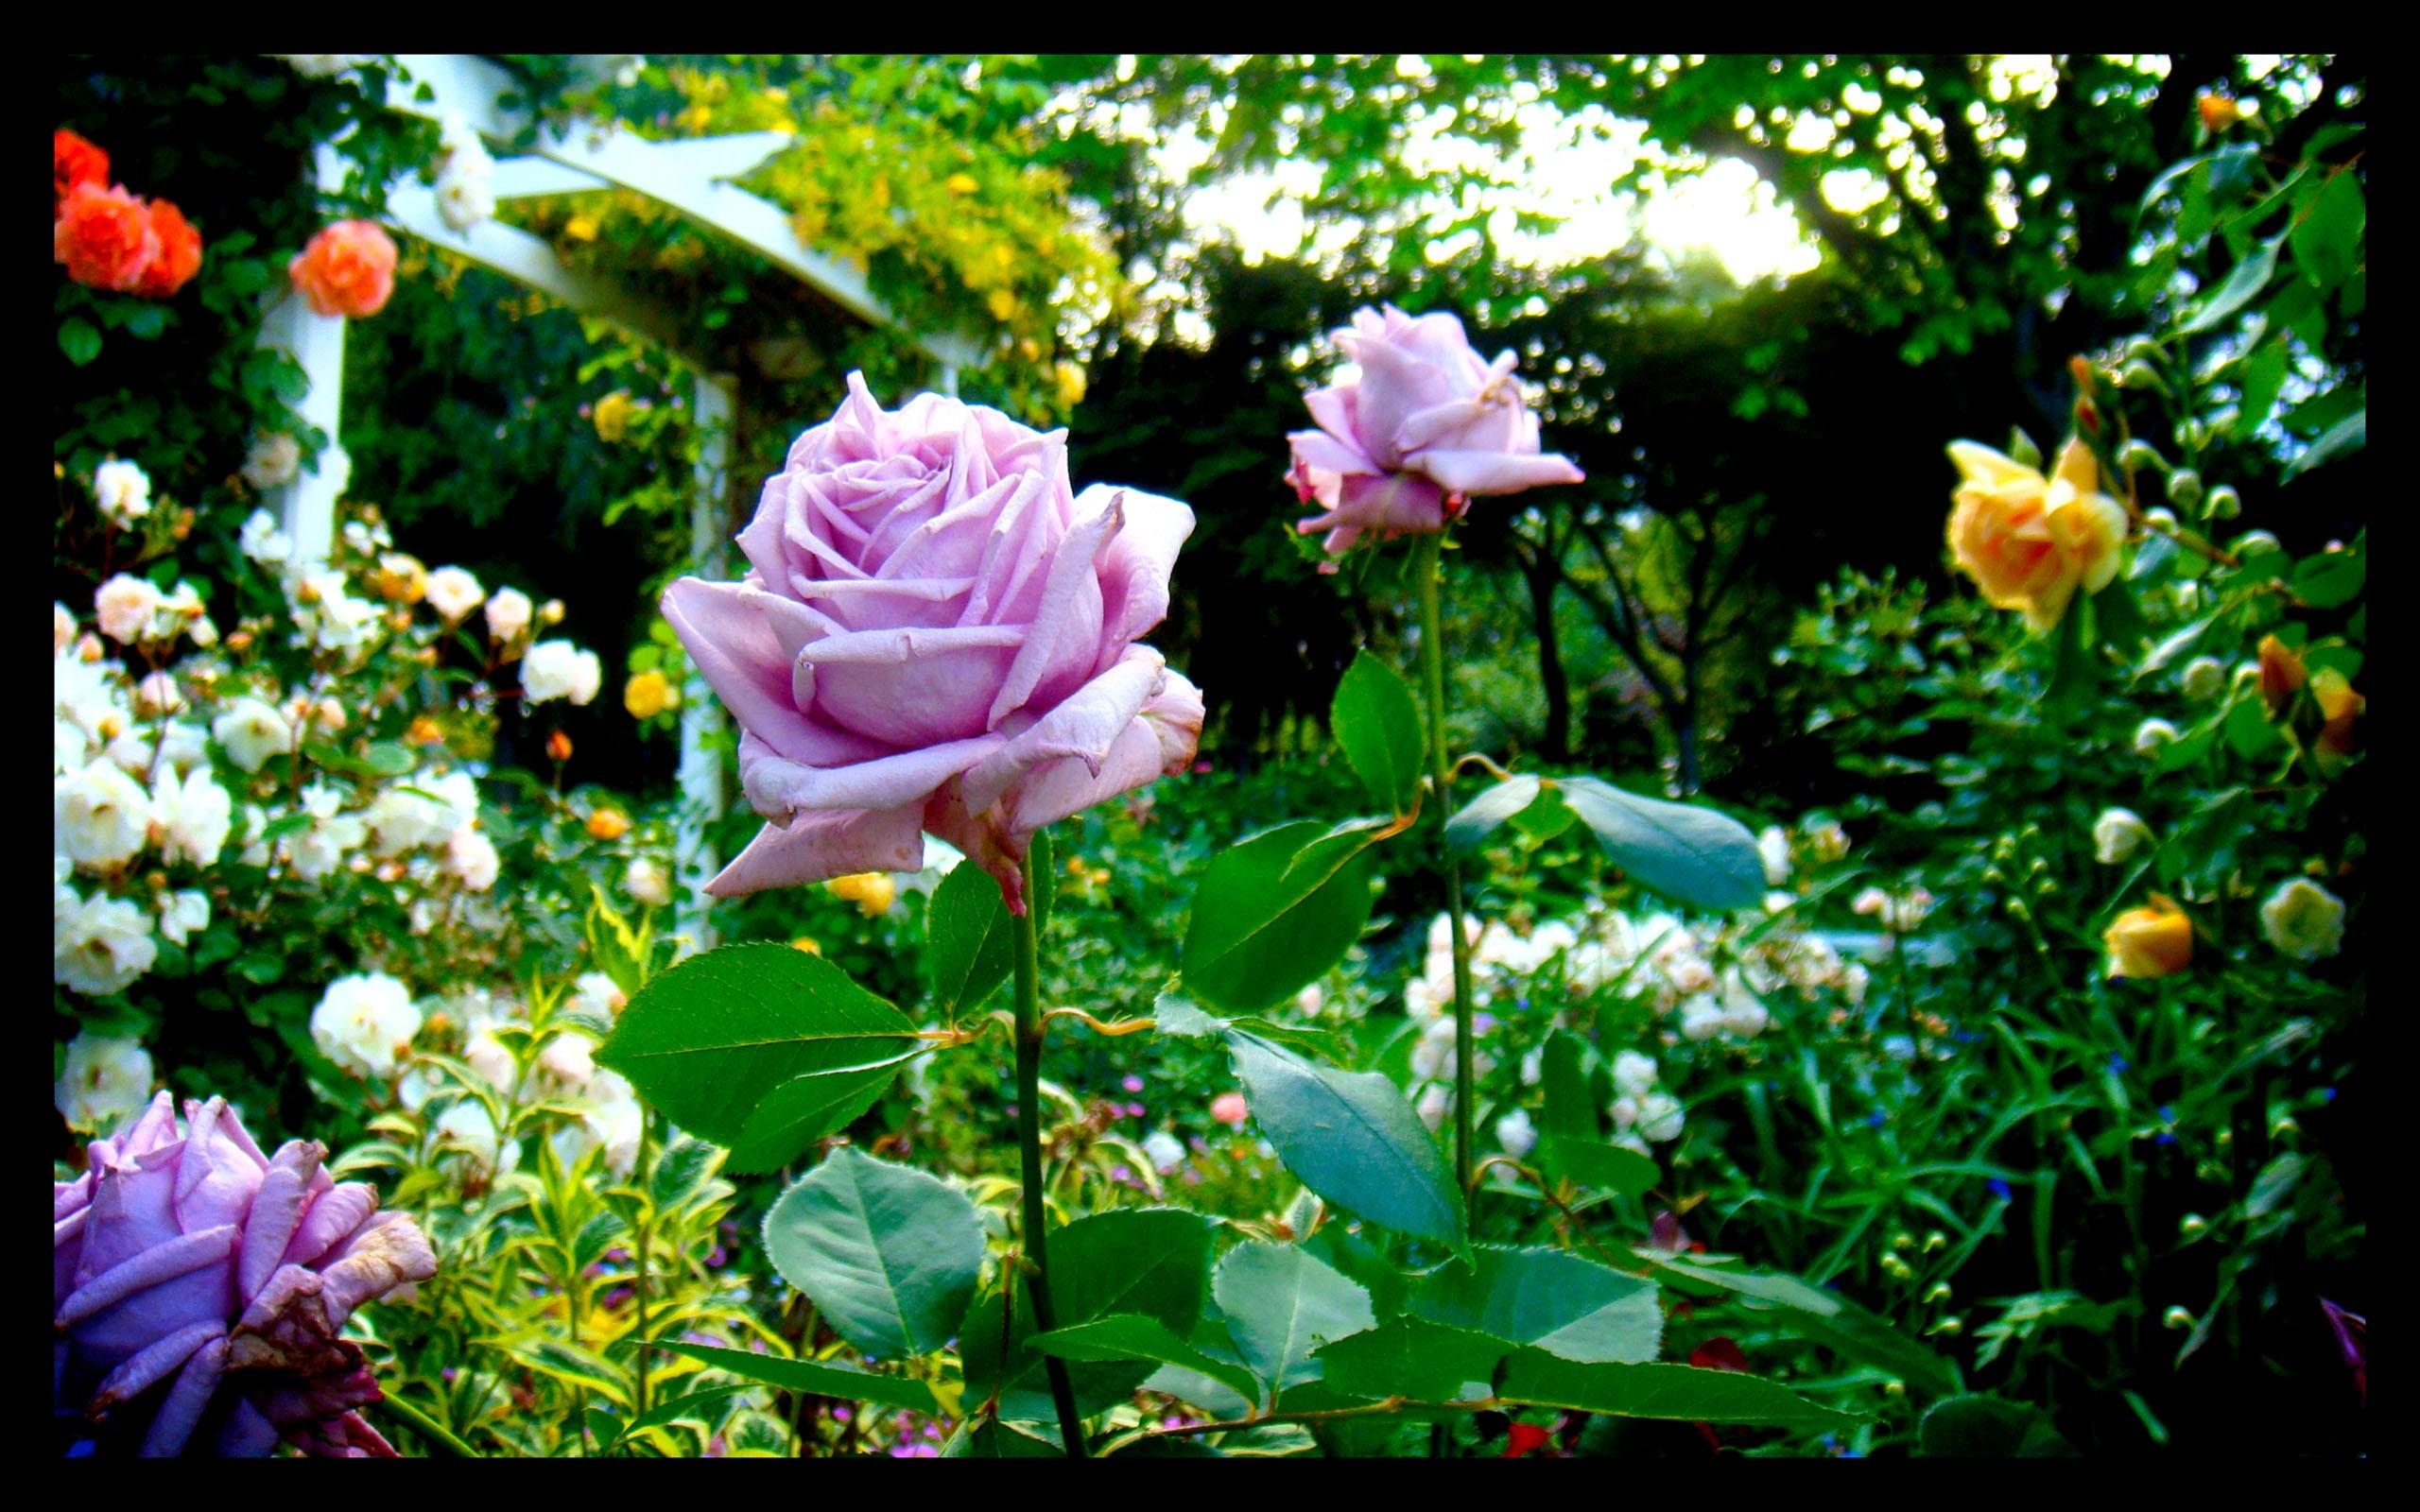 Flower Garden Hd Wallpaper Free Download